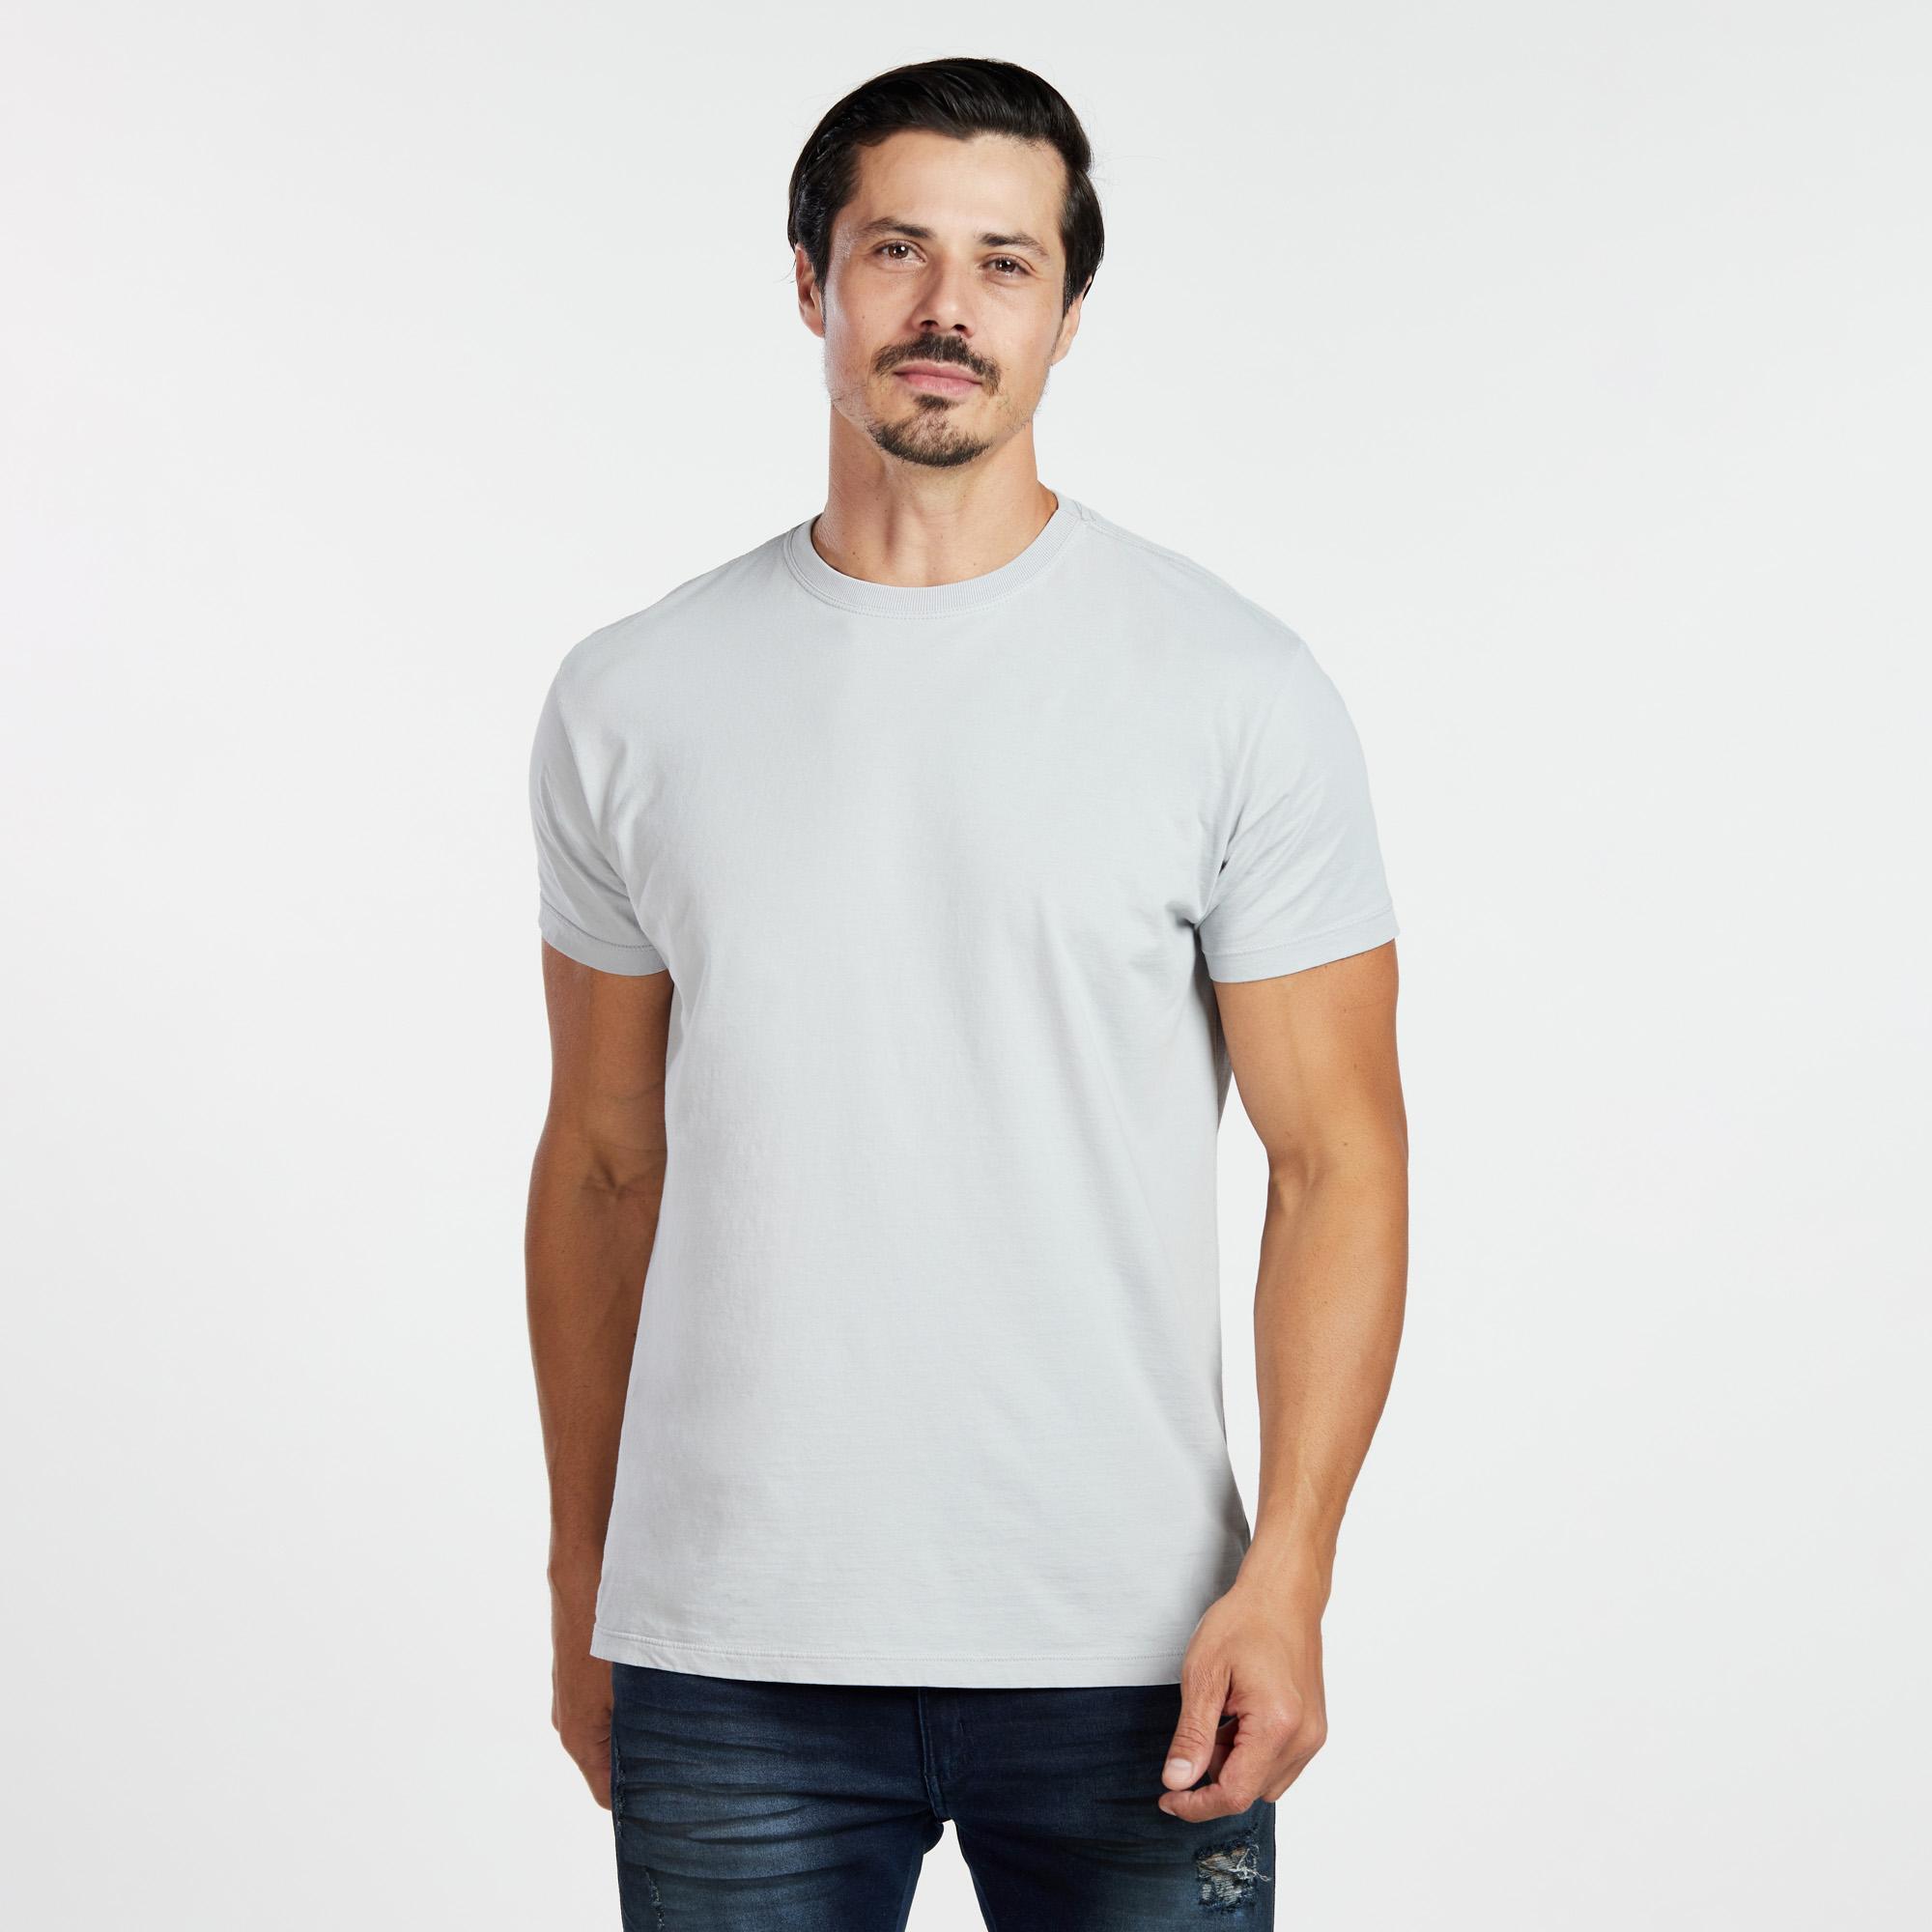 Camiseta Masculina Reativo Cinza Claro